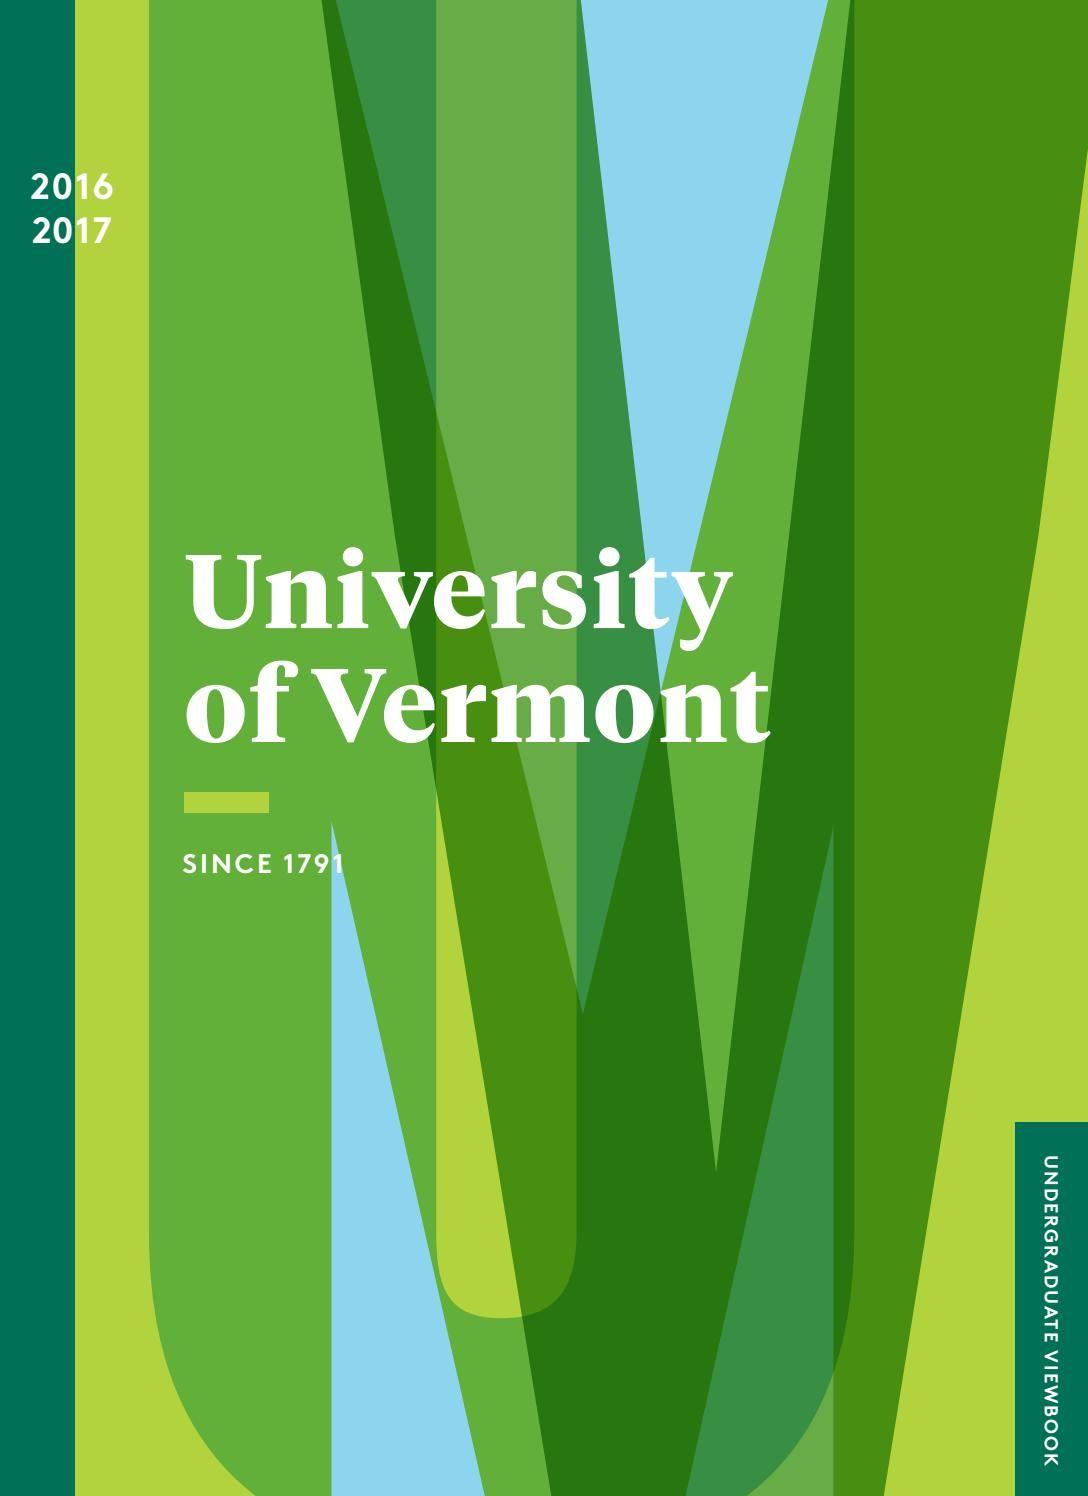 University of Vermont 2016 Admissions Viewbook